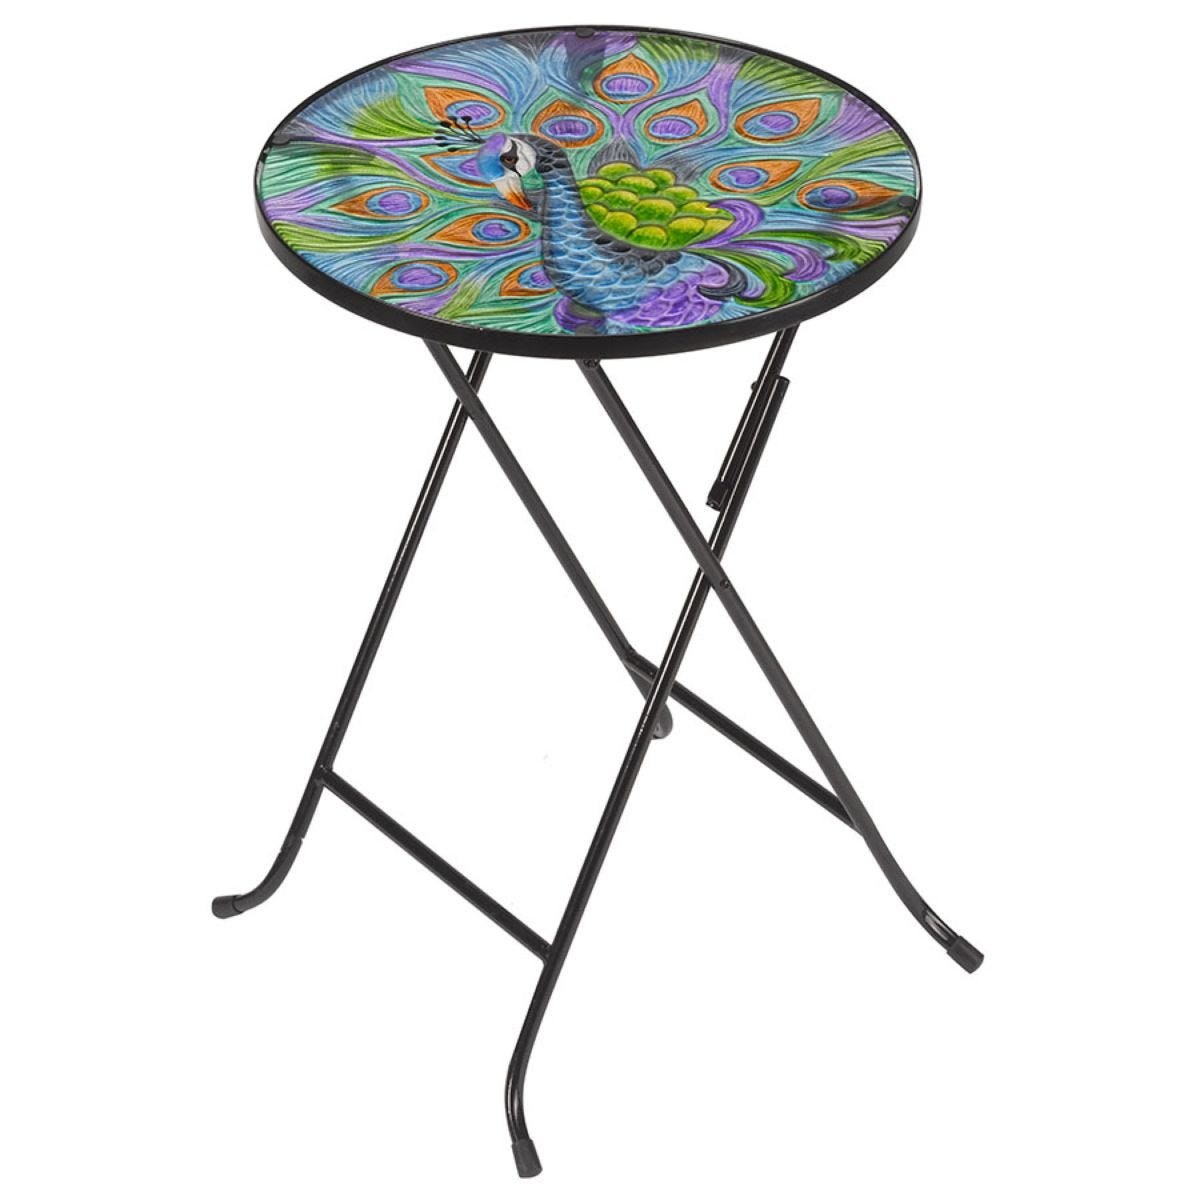 Flamboya Peacock Glass Folding Table